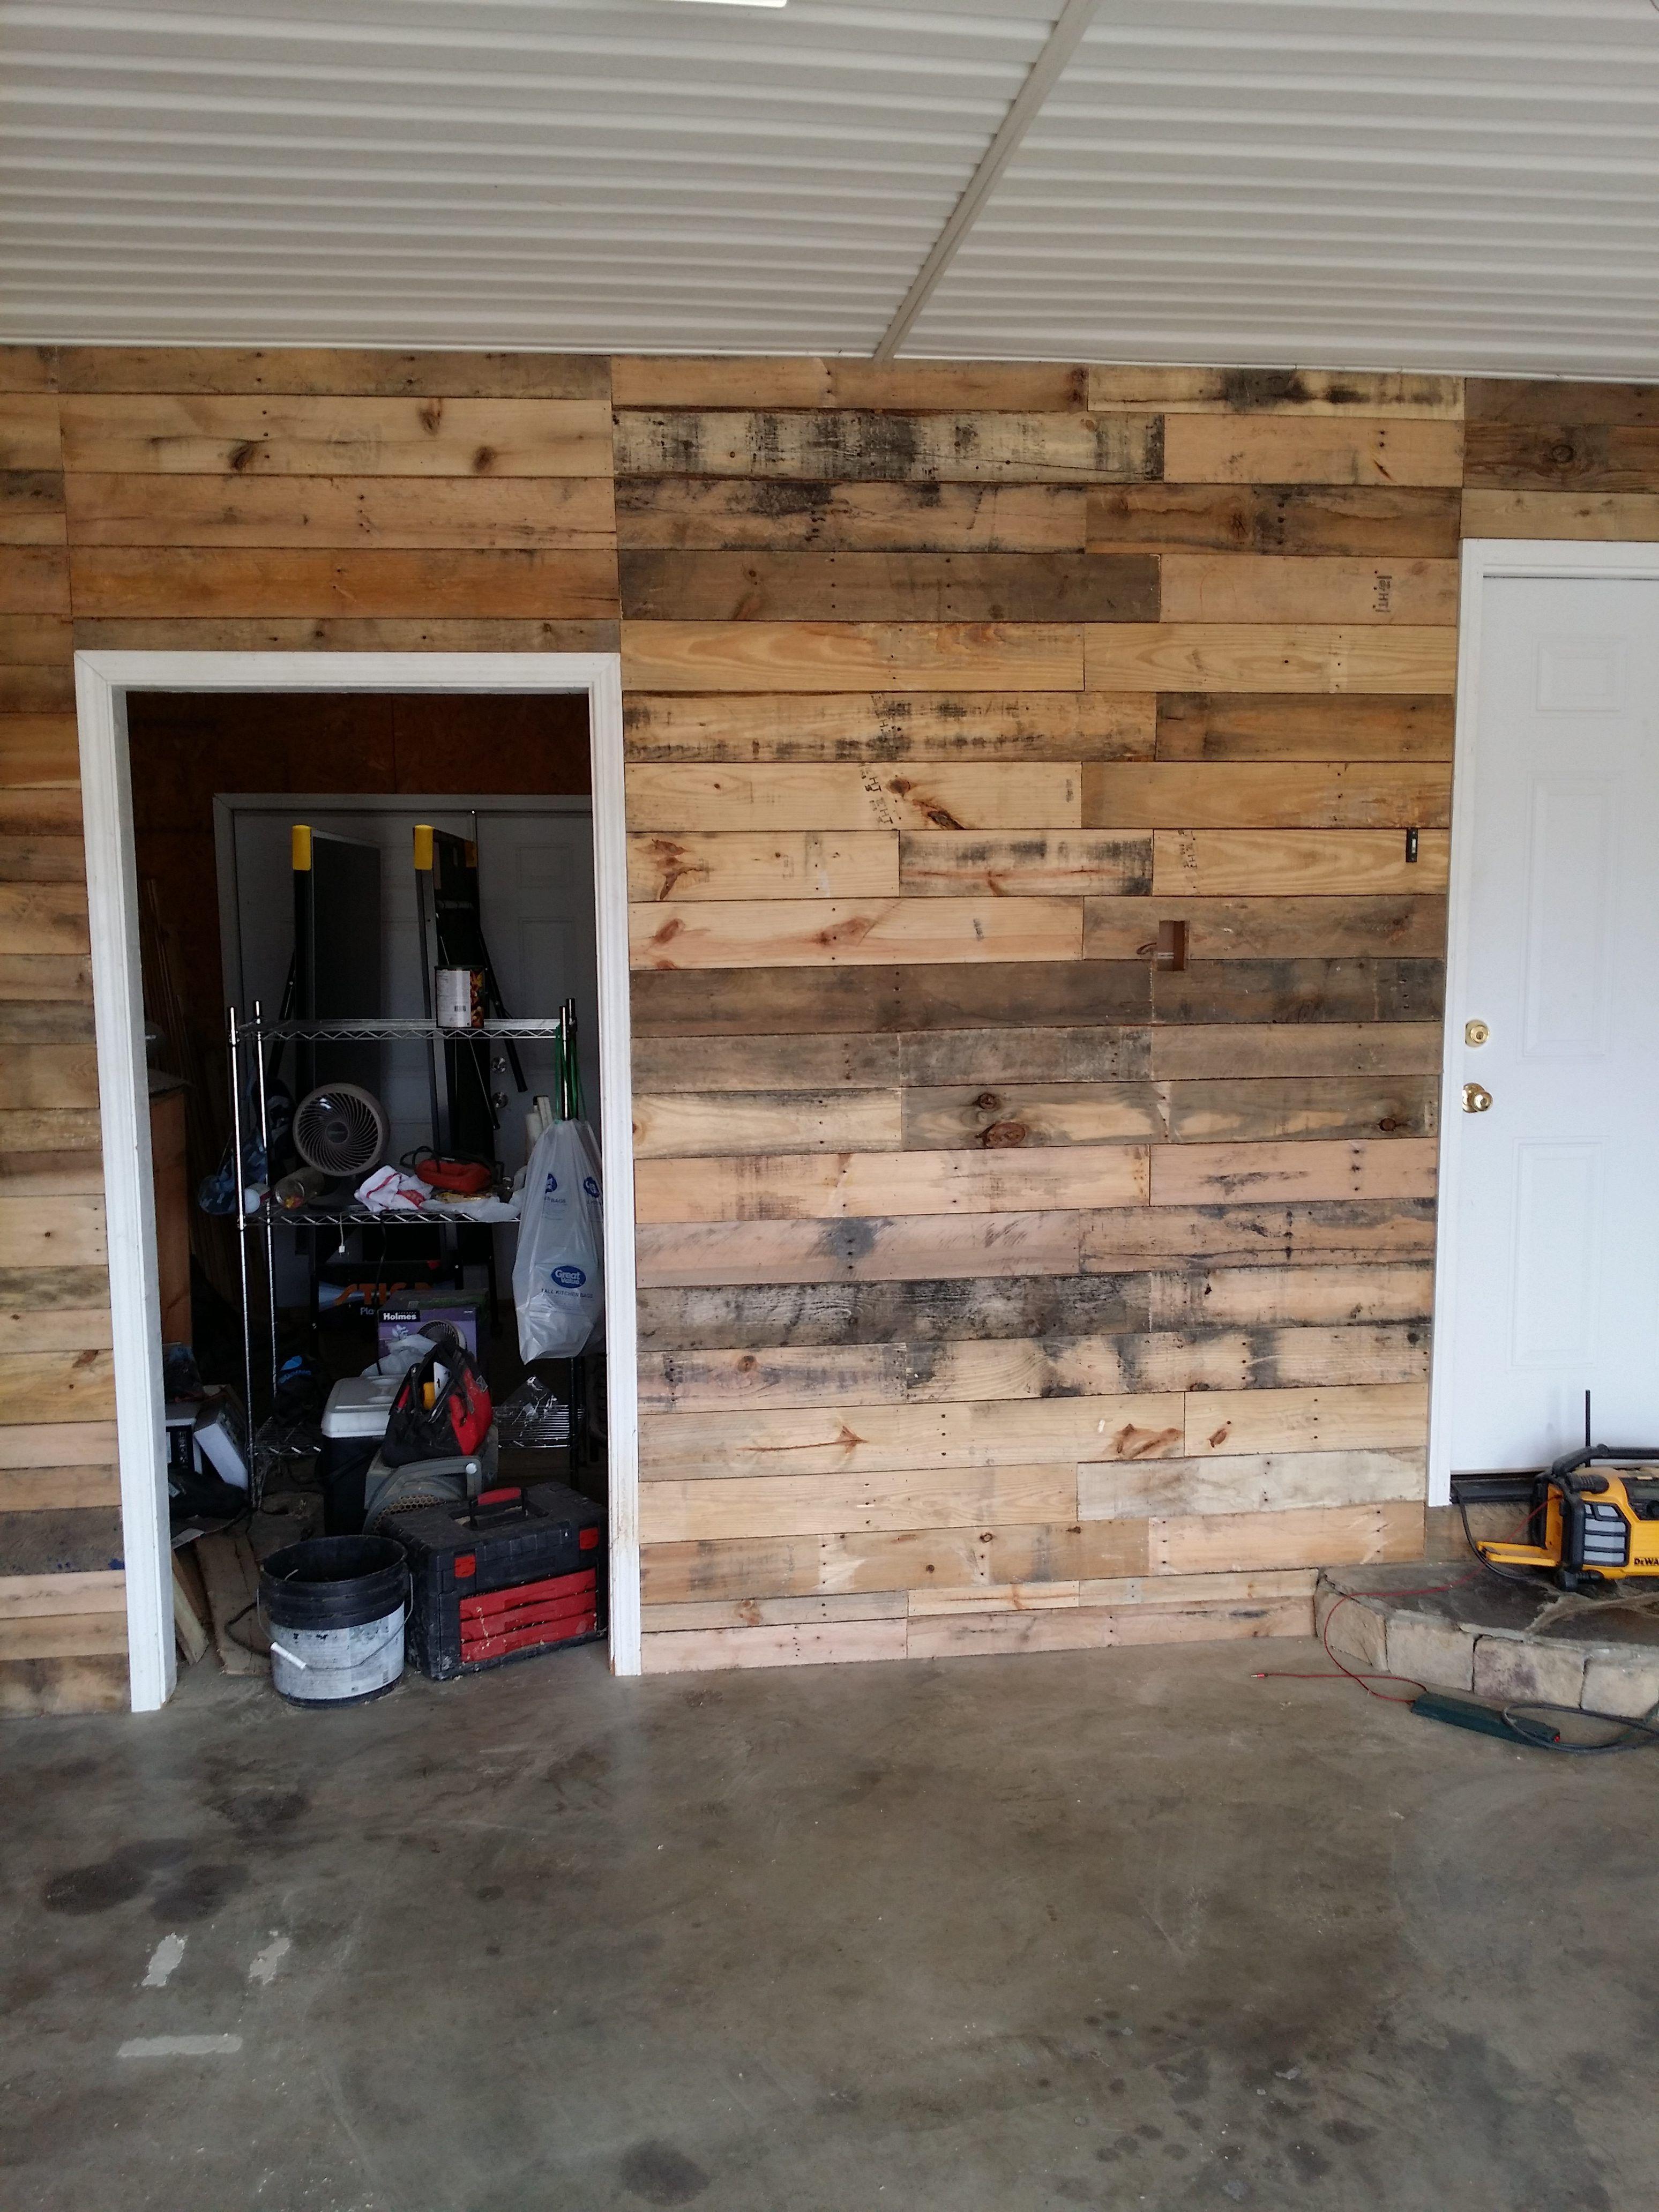 25 Brilliant Garage Wall Ideas Design And Remodel Pictures Tags Garage Wall Paint Ideas Garage Interior Wall Garage Decor Garage Walls Wood Pallet Wall